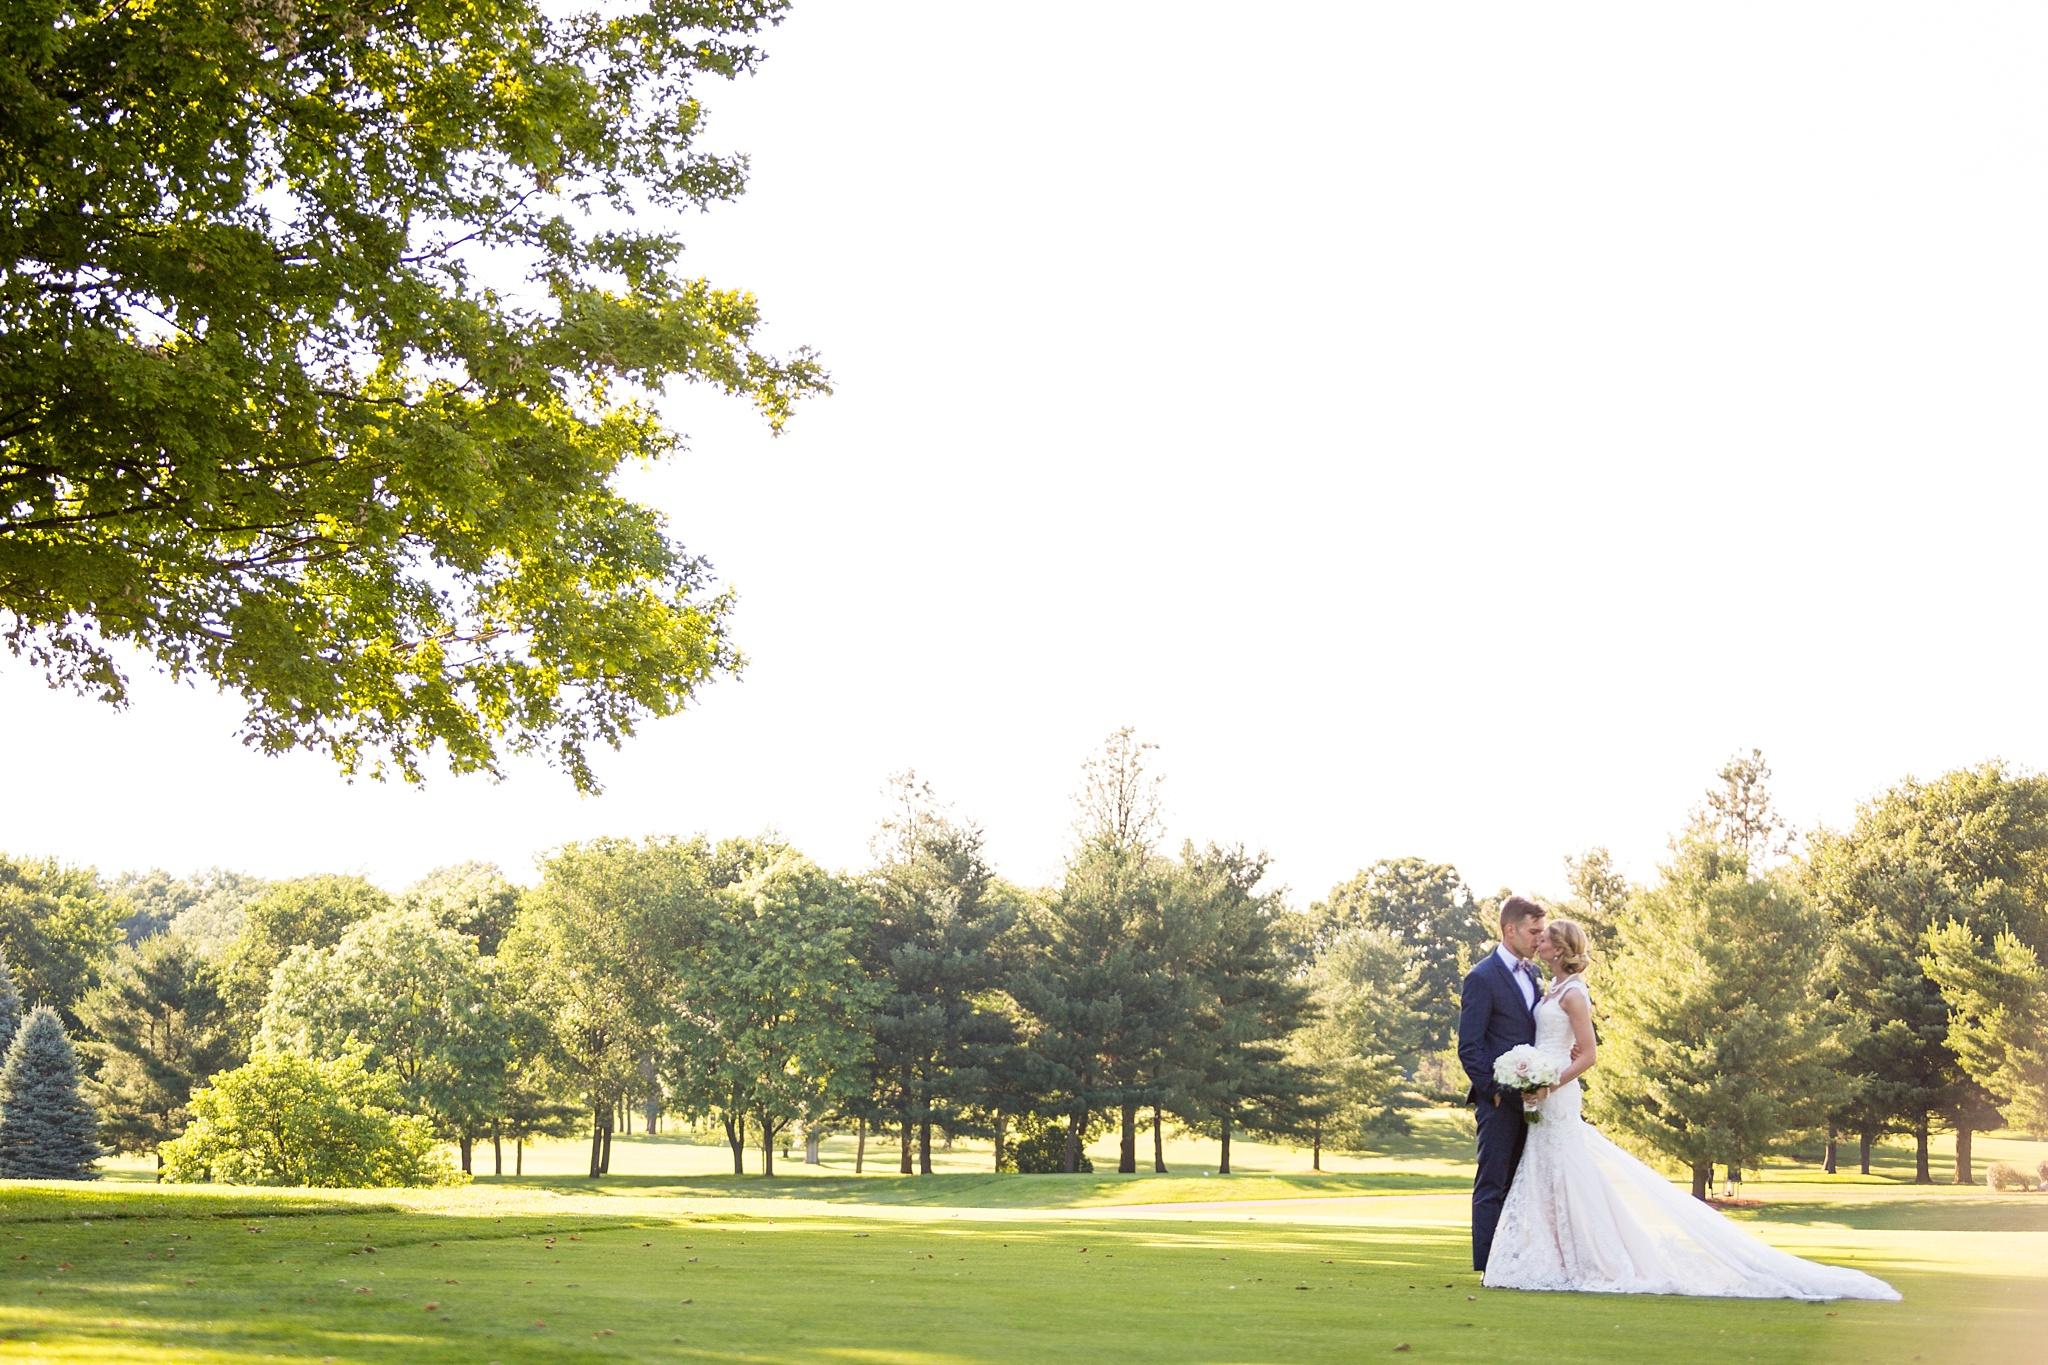 Becky_Cameron_Grand_Rapids_Blythefield Country_Club_Wedding051.JPG